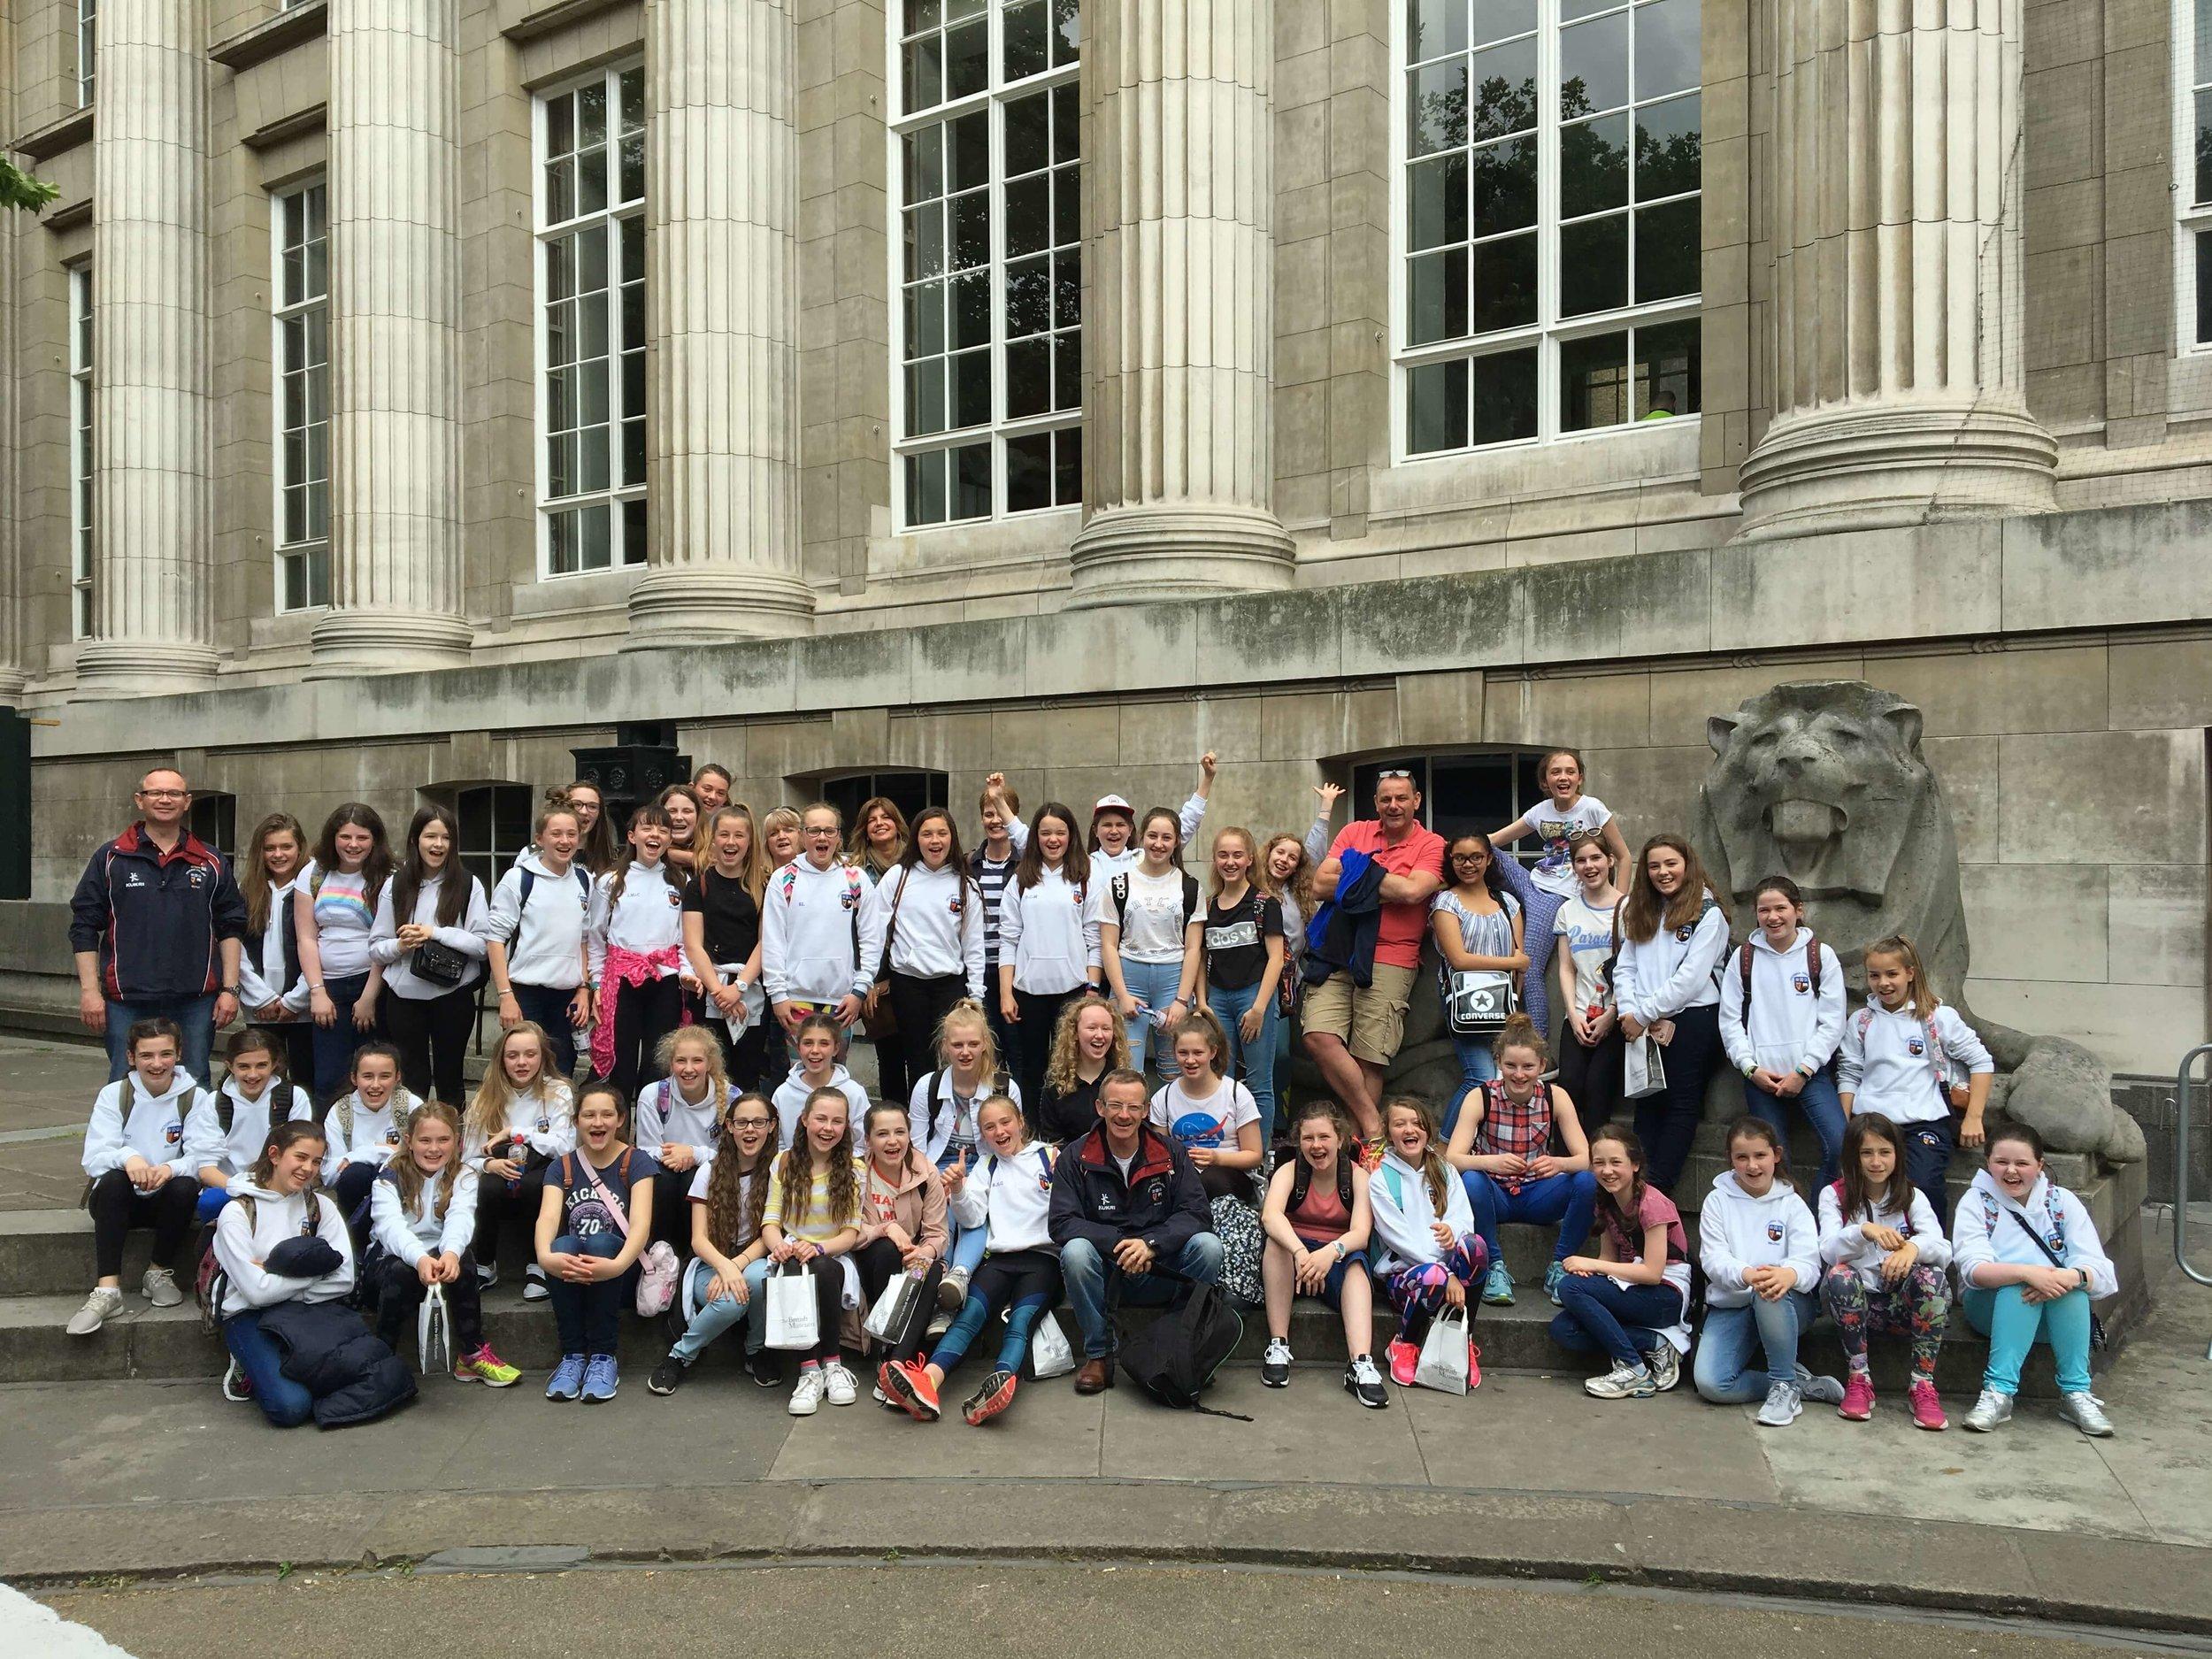 VCB-Group-Photo-London-1169tny.JPG